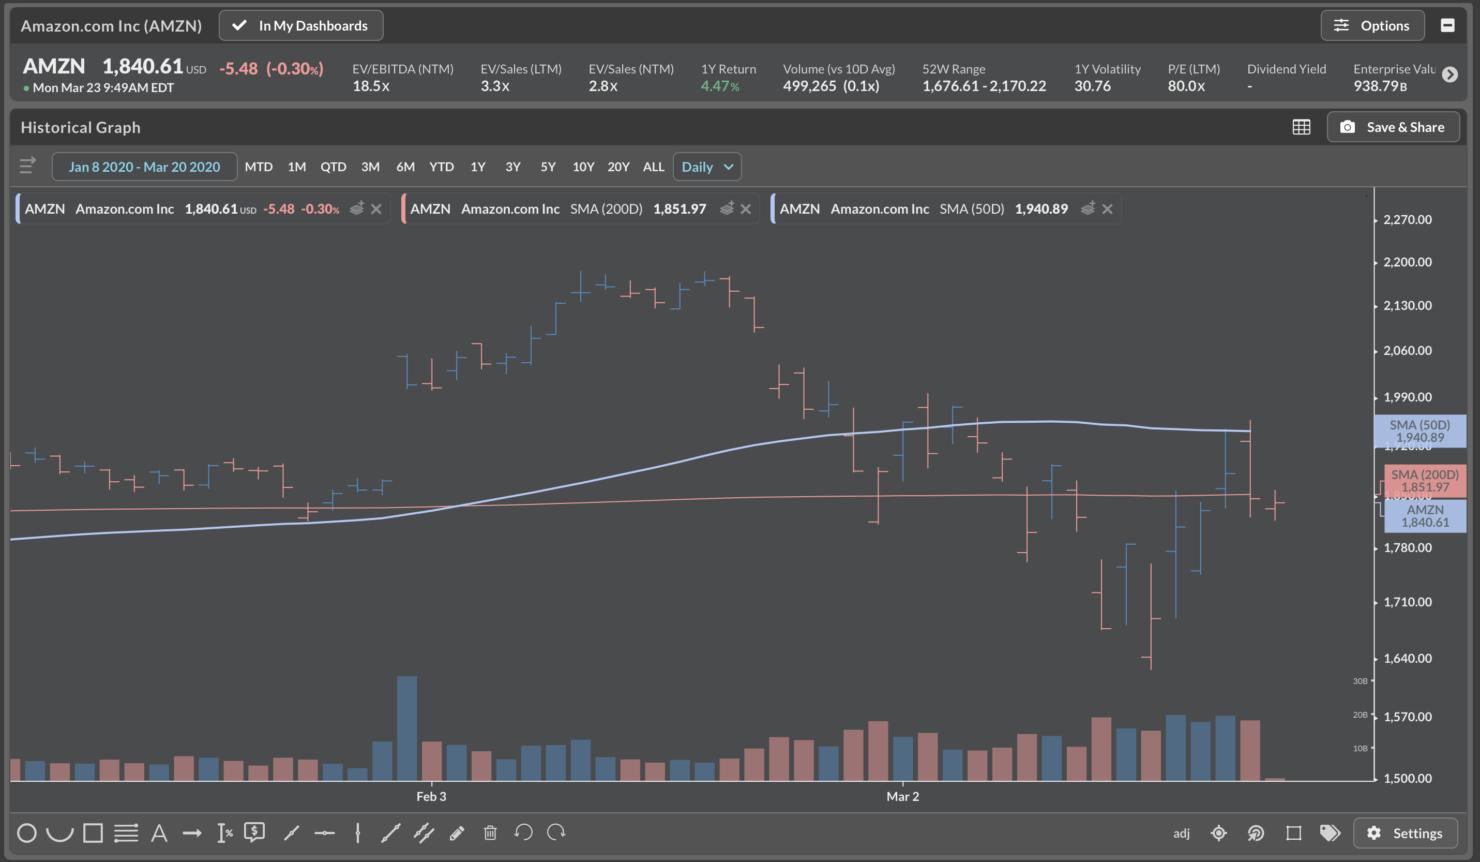 NASDAQ:AMZN index value drops coronavirus